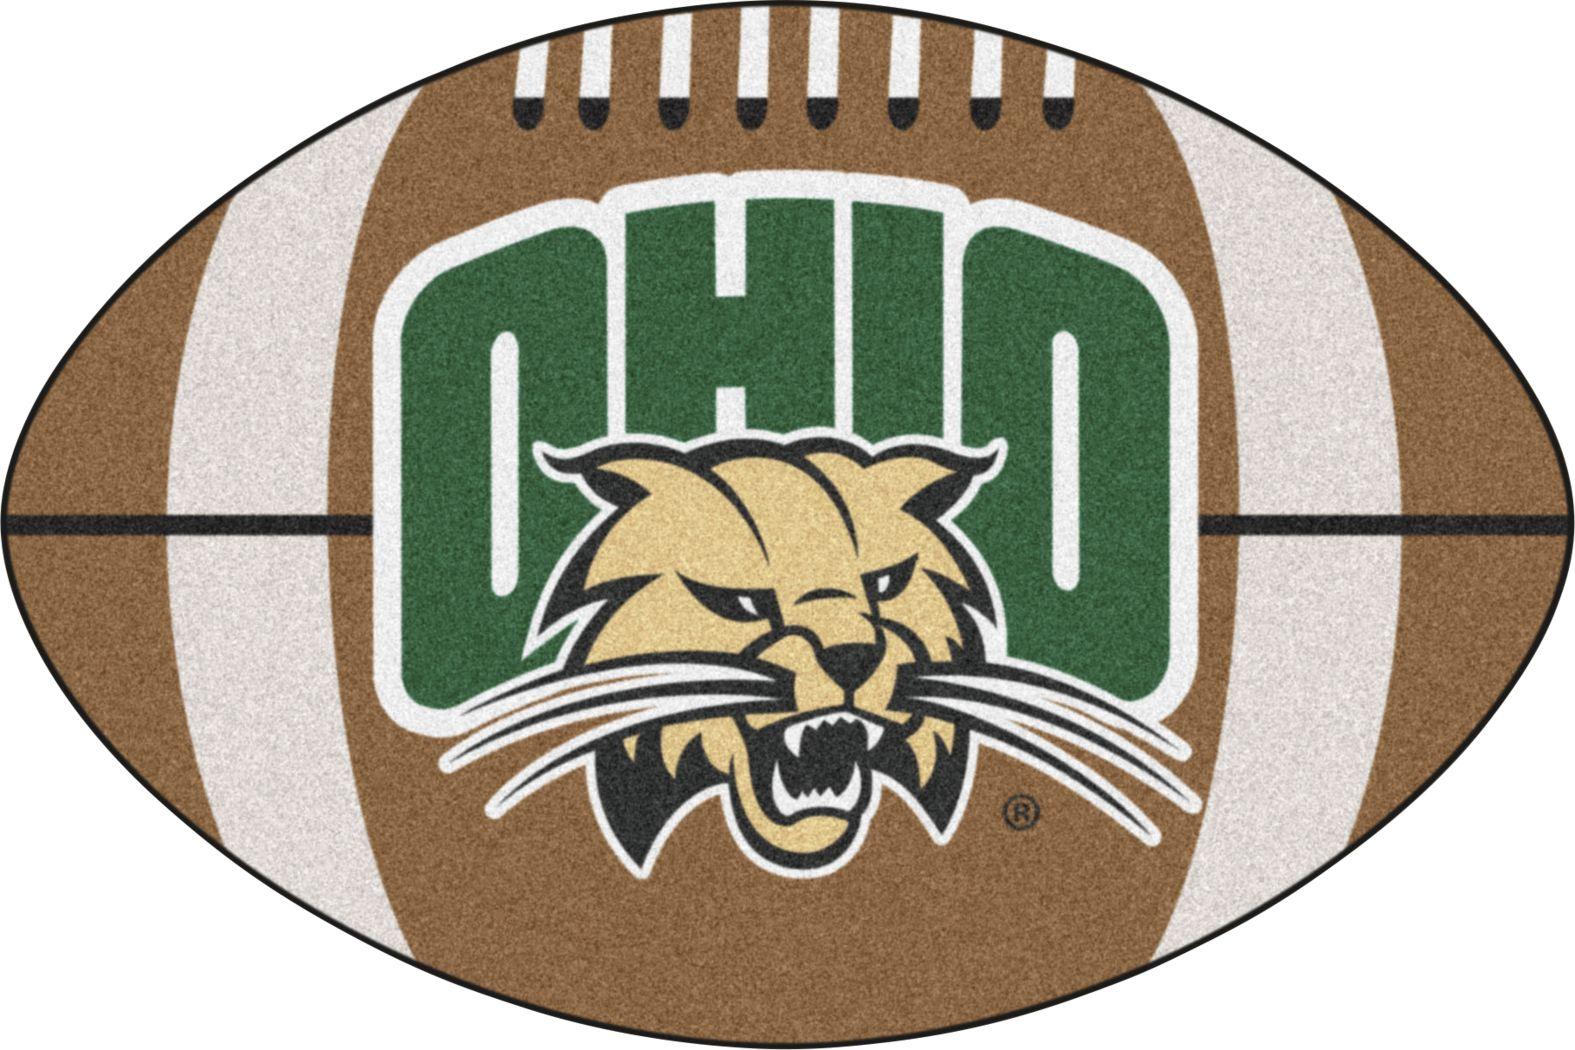 "NCAA Football Mascot Ohio University 1'6"" x 1'10"" Rug"